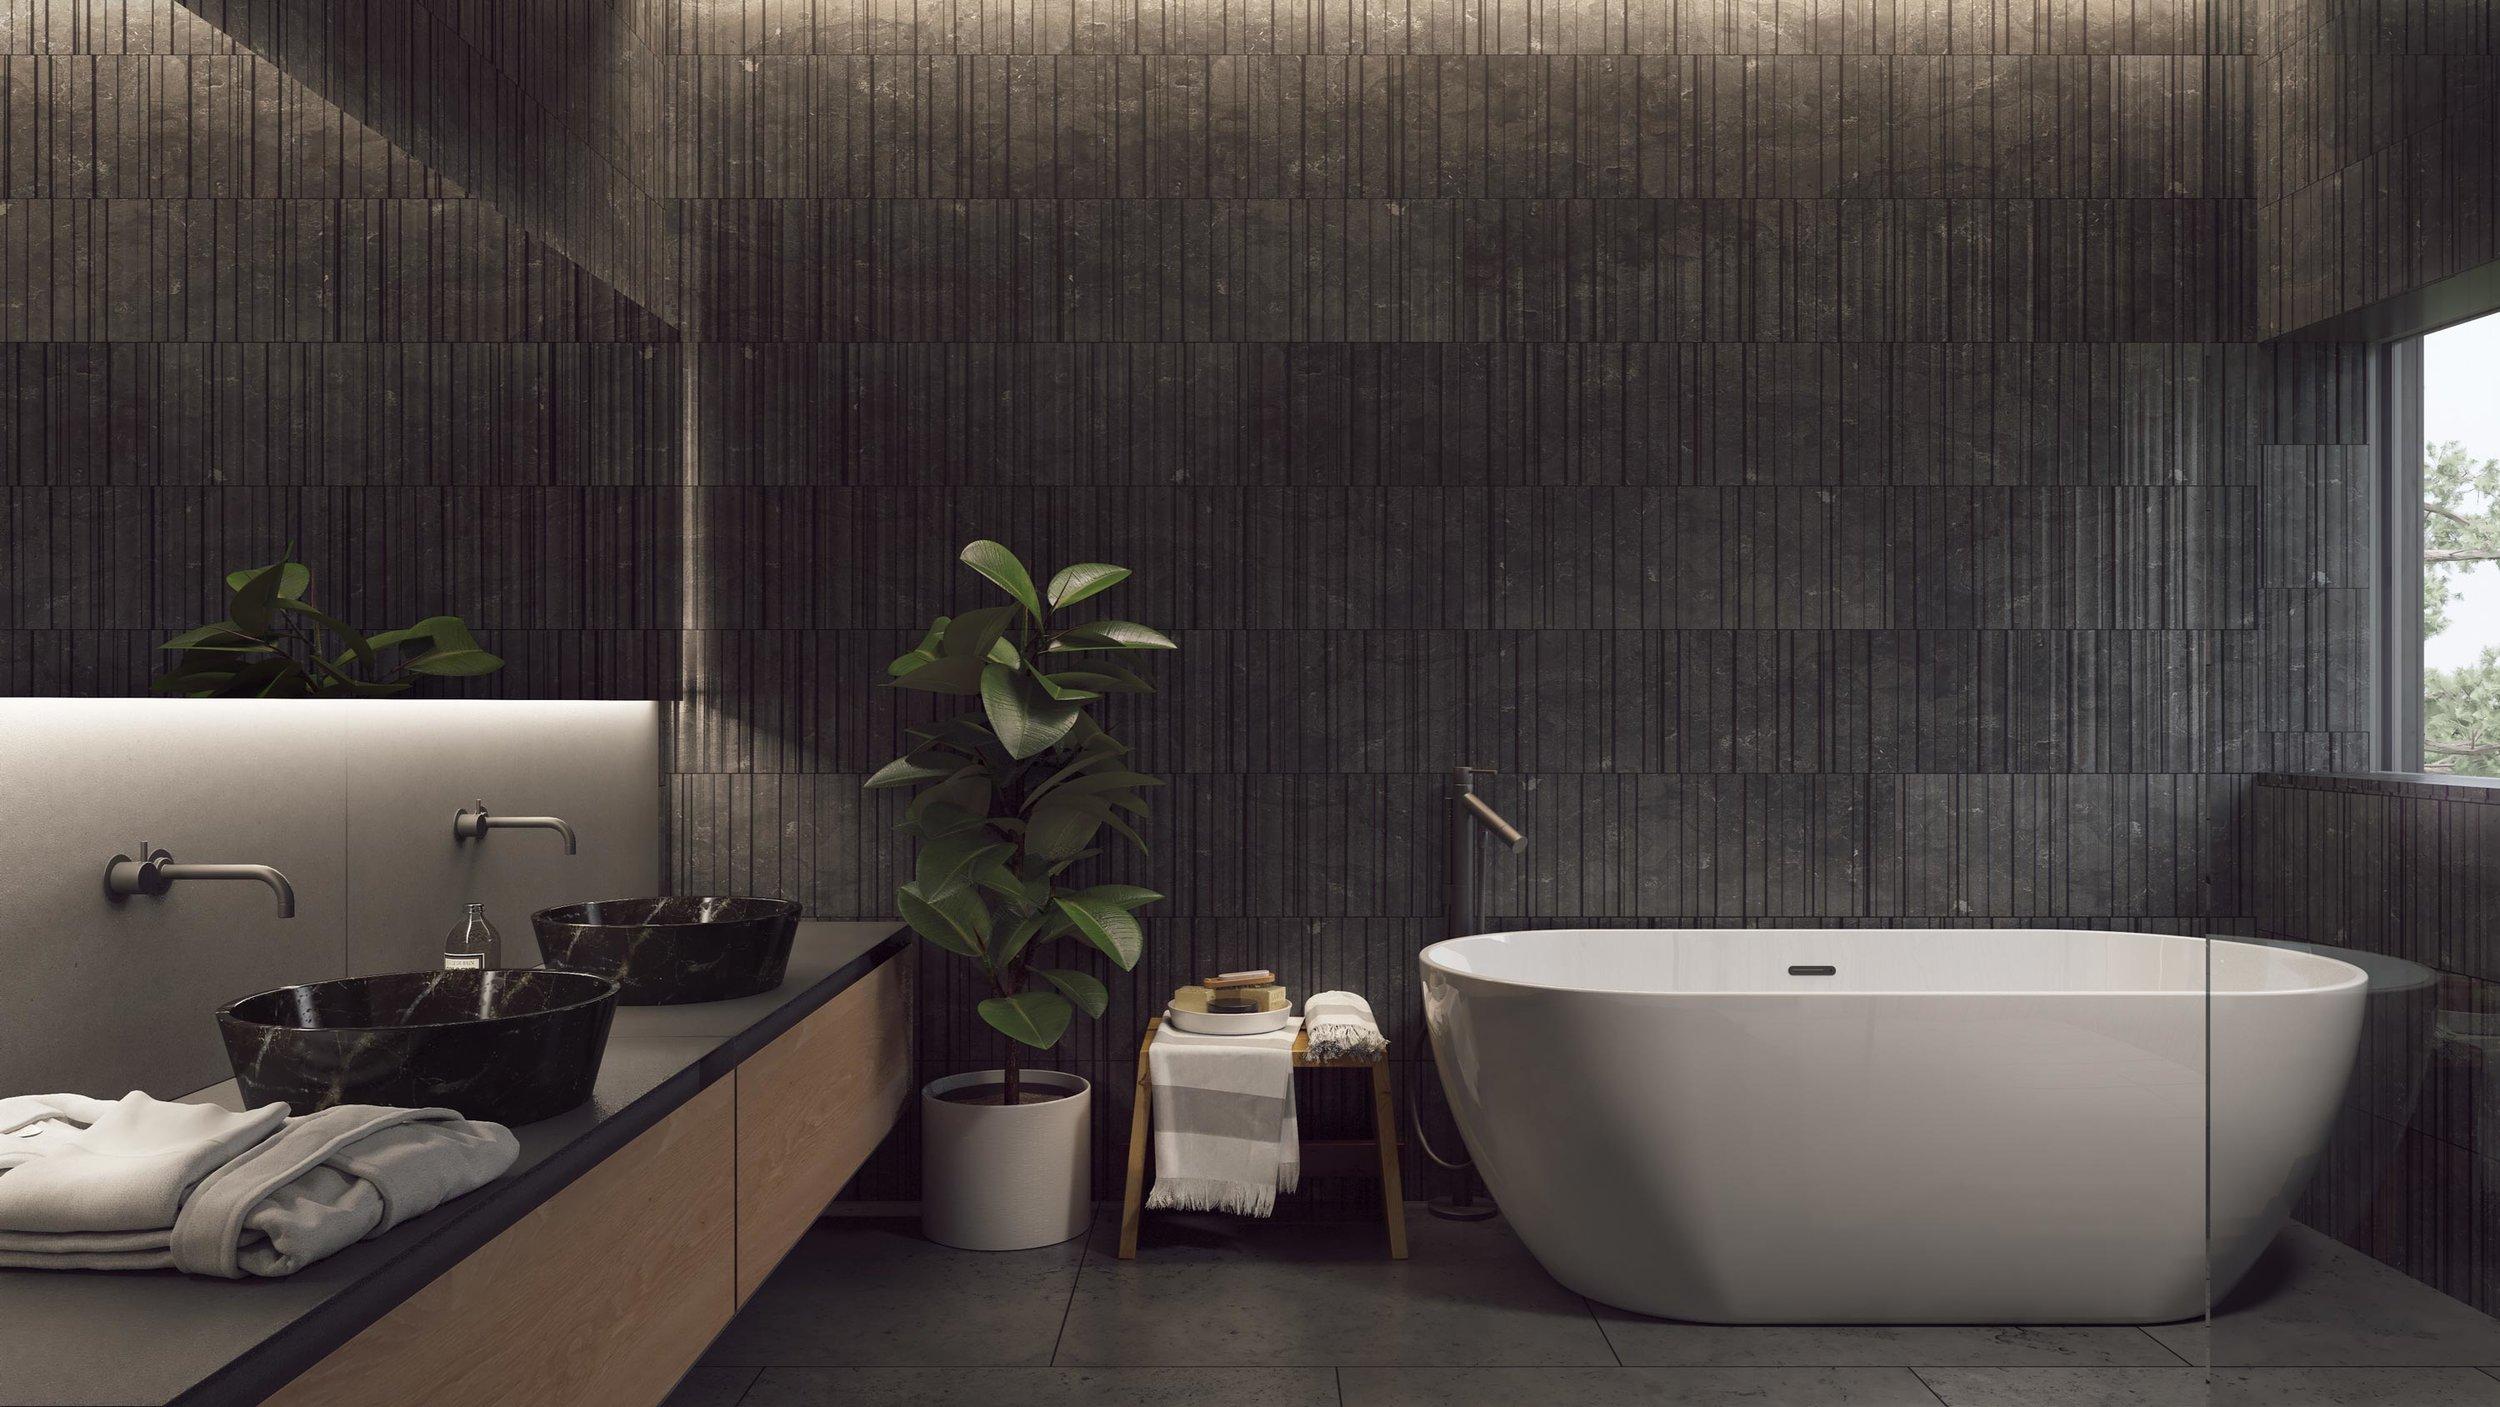 pyrus luxury villas, strom architects, imola, 14.jpg